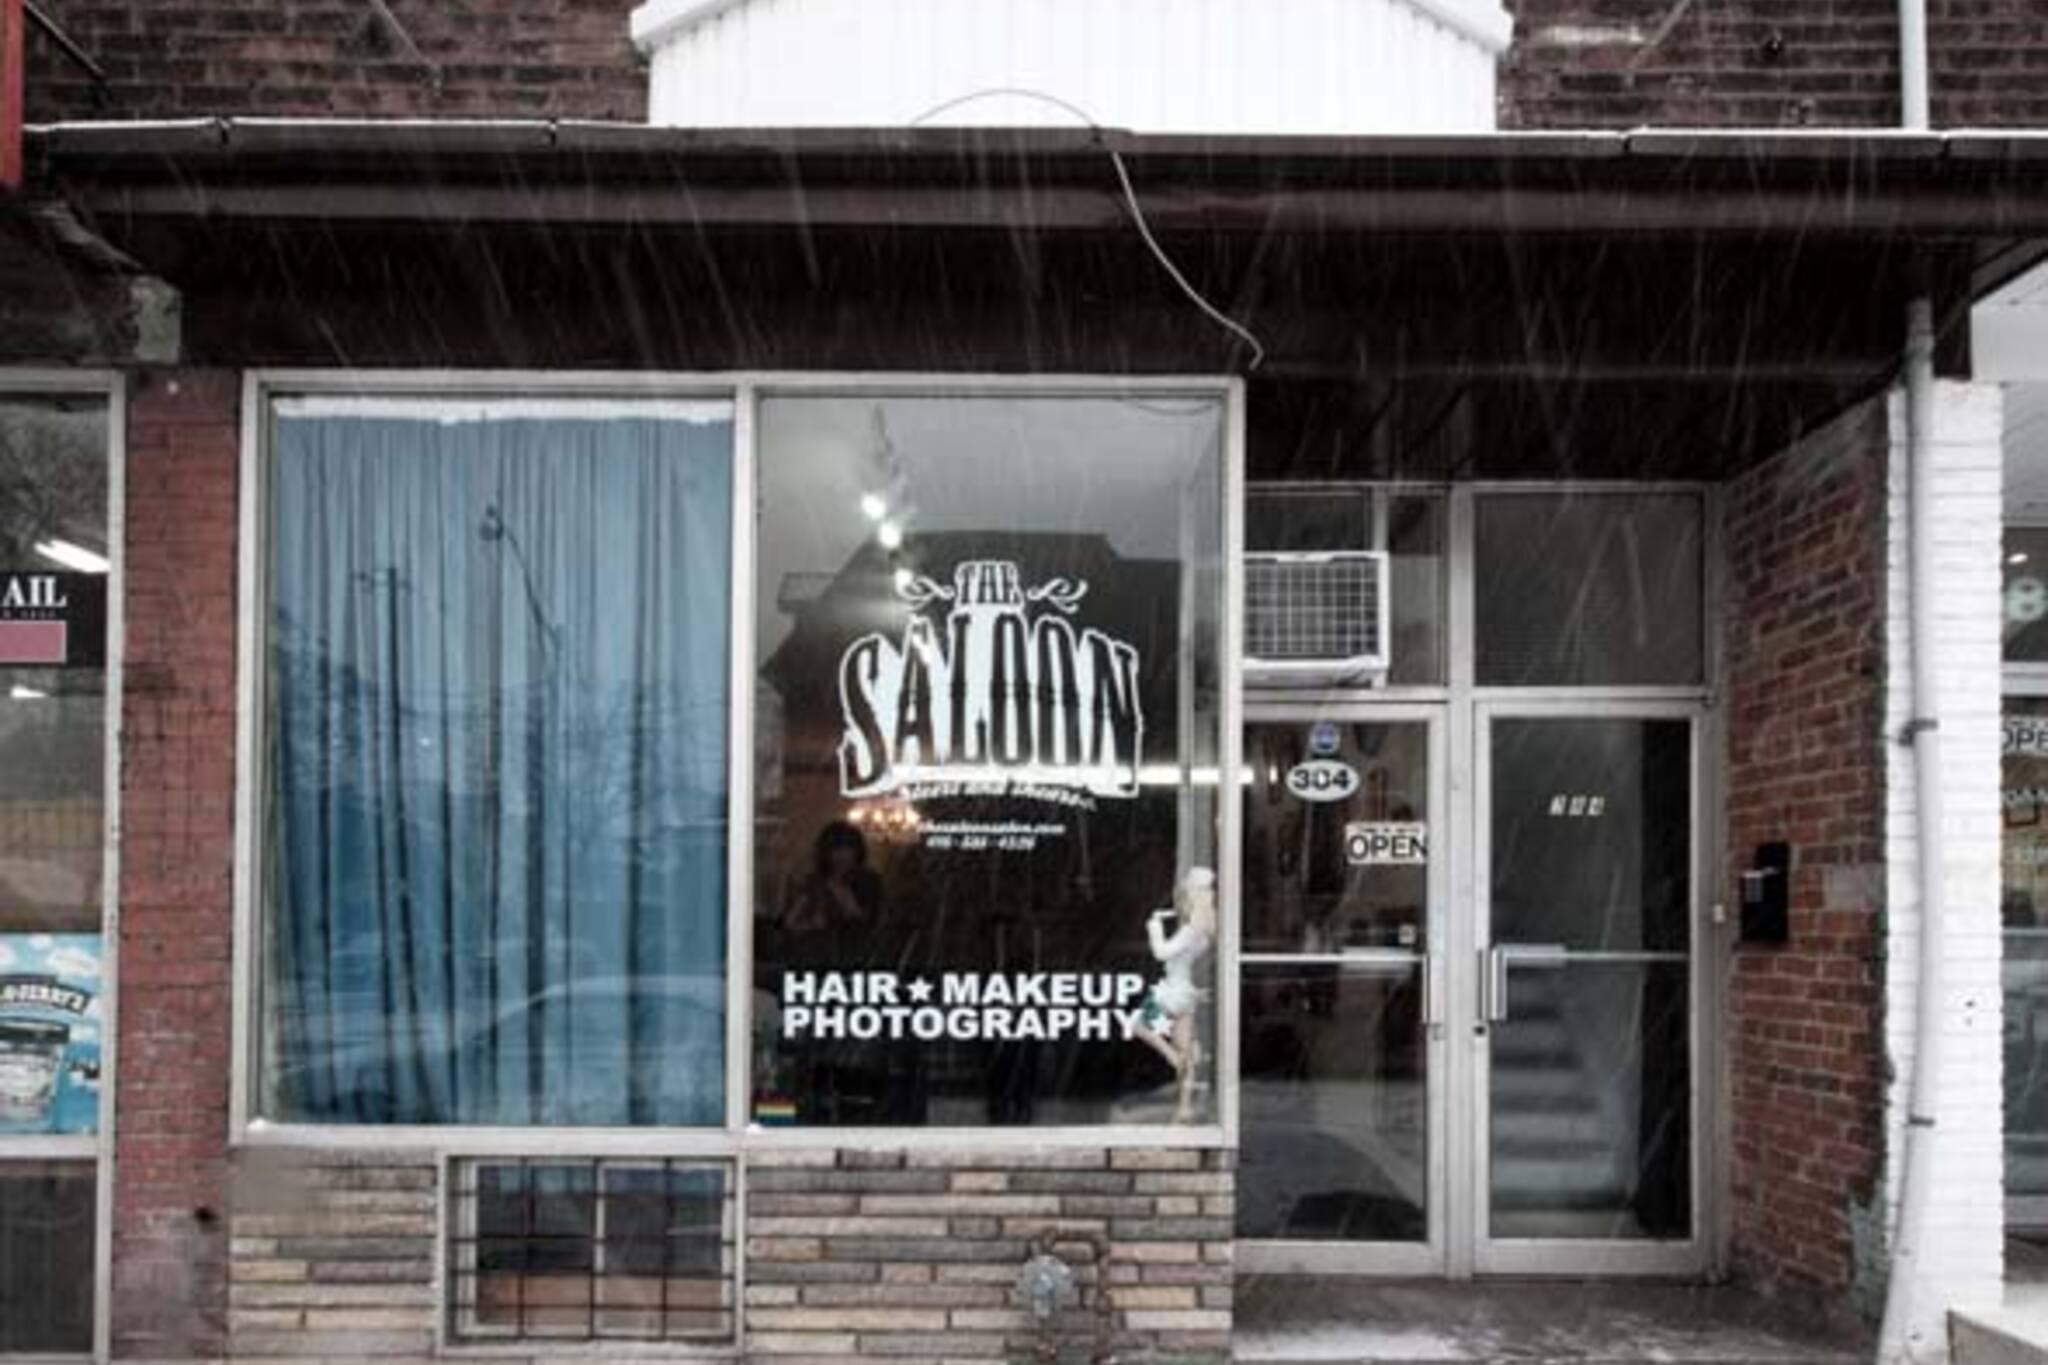 The Saloon Toronto